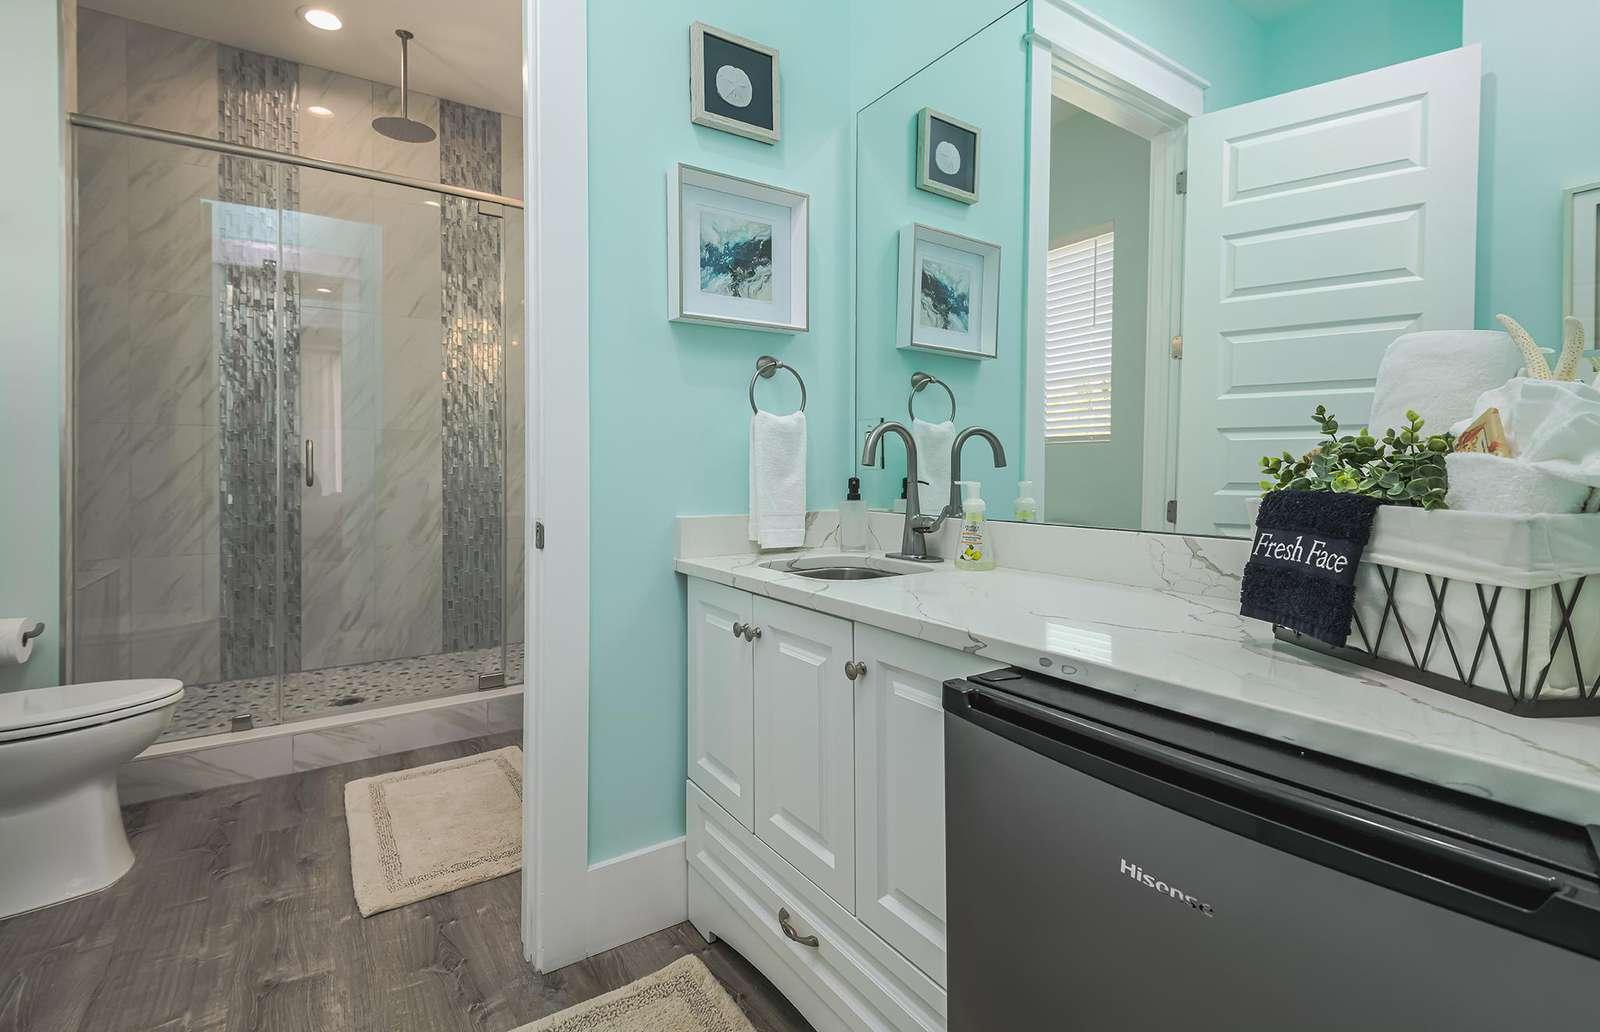 Your private master bath with economy fridge!